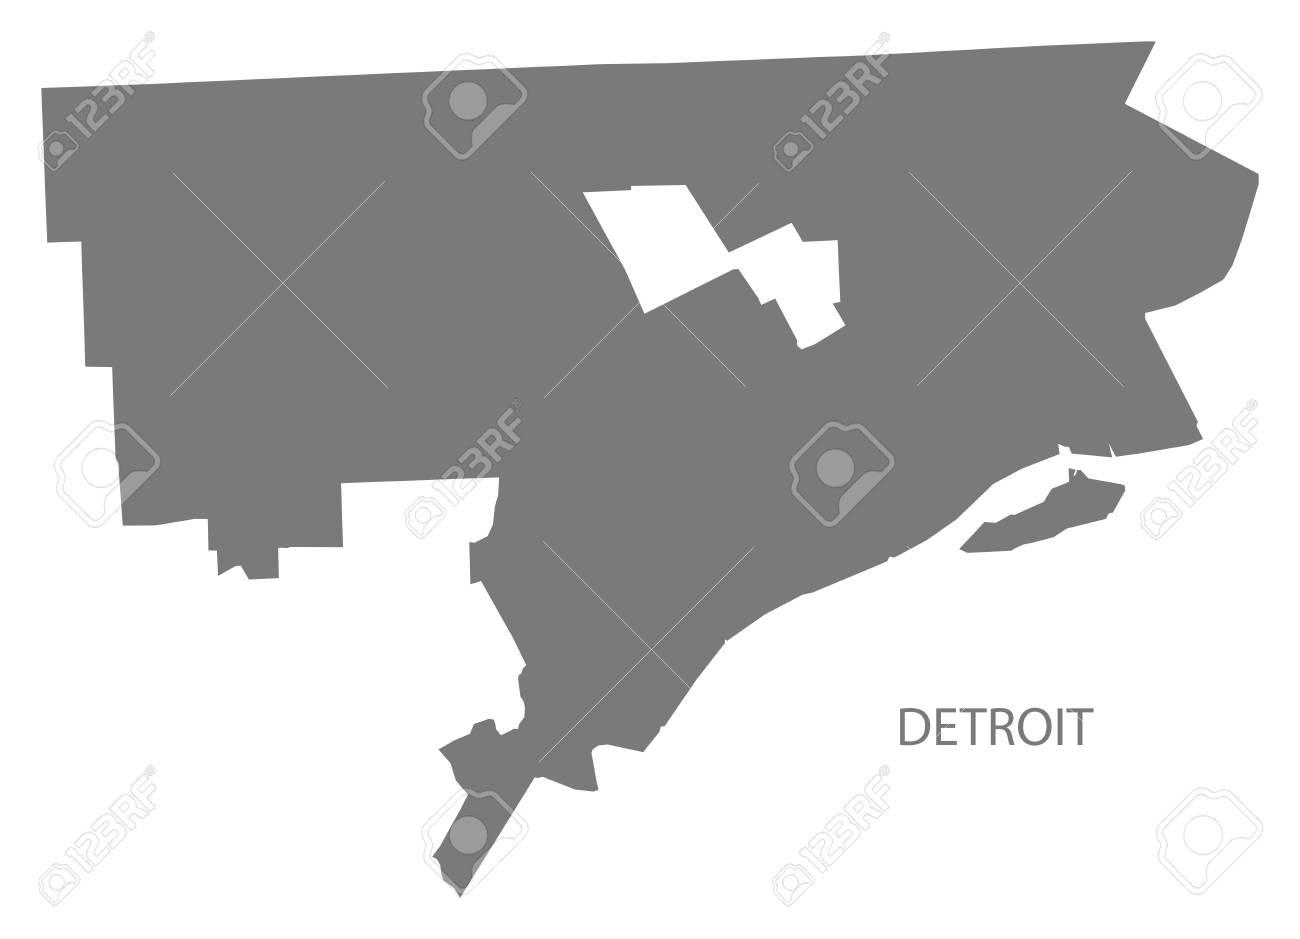 Detroit Michigan city map grey illustration silhouette shape